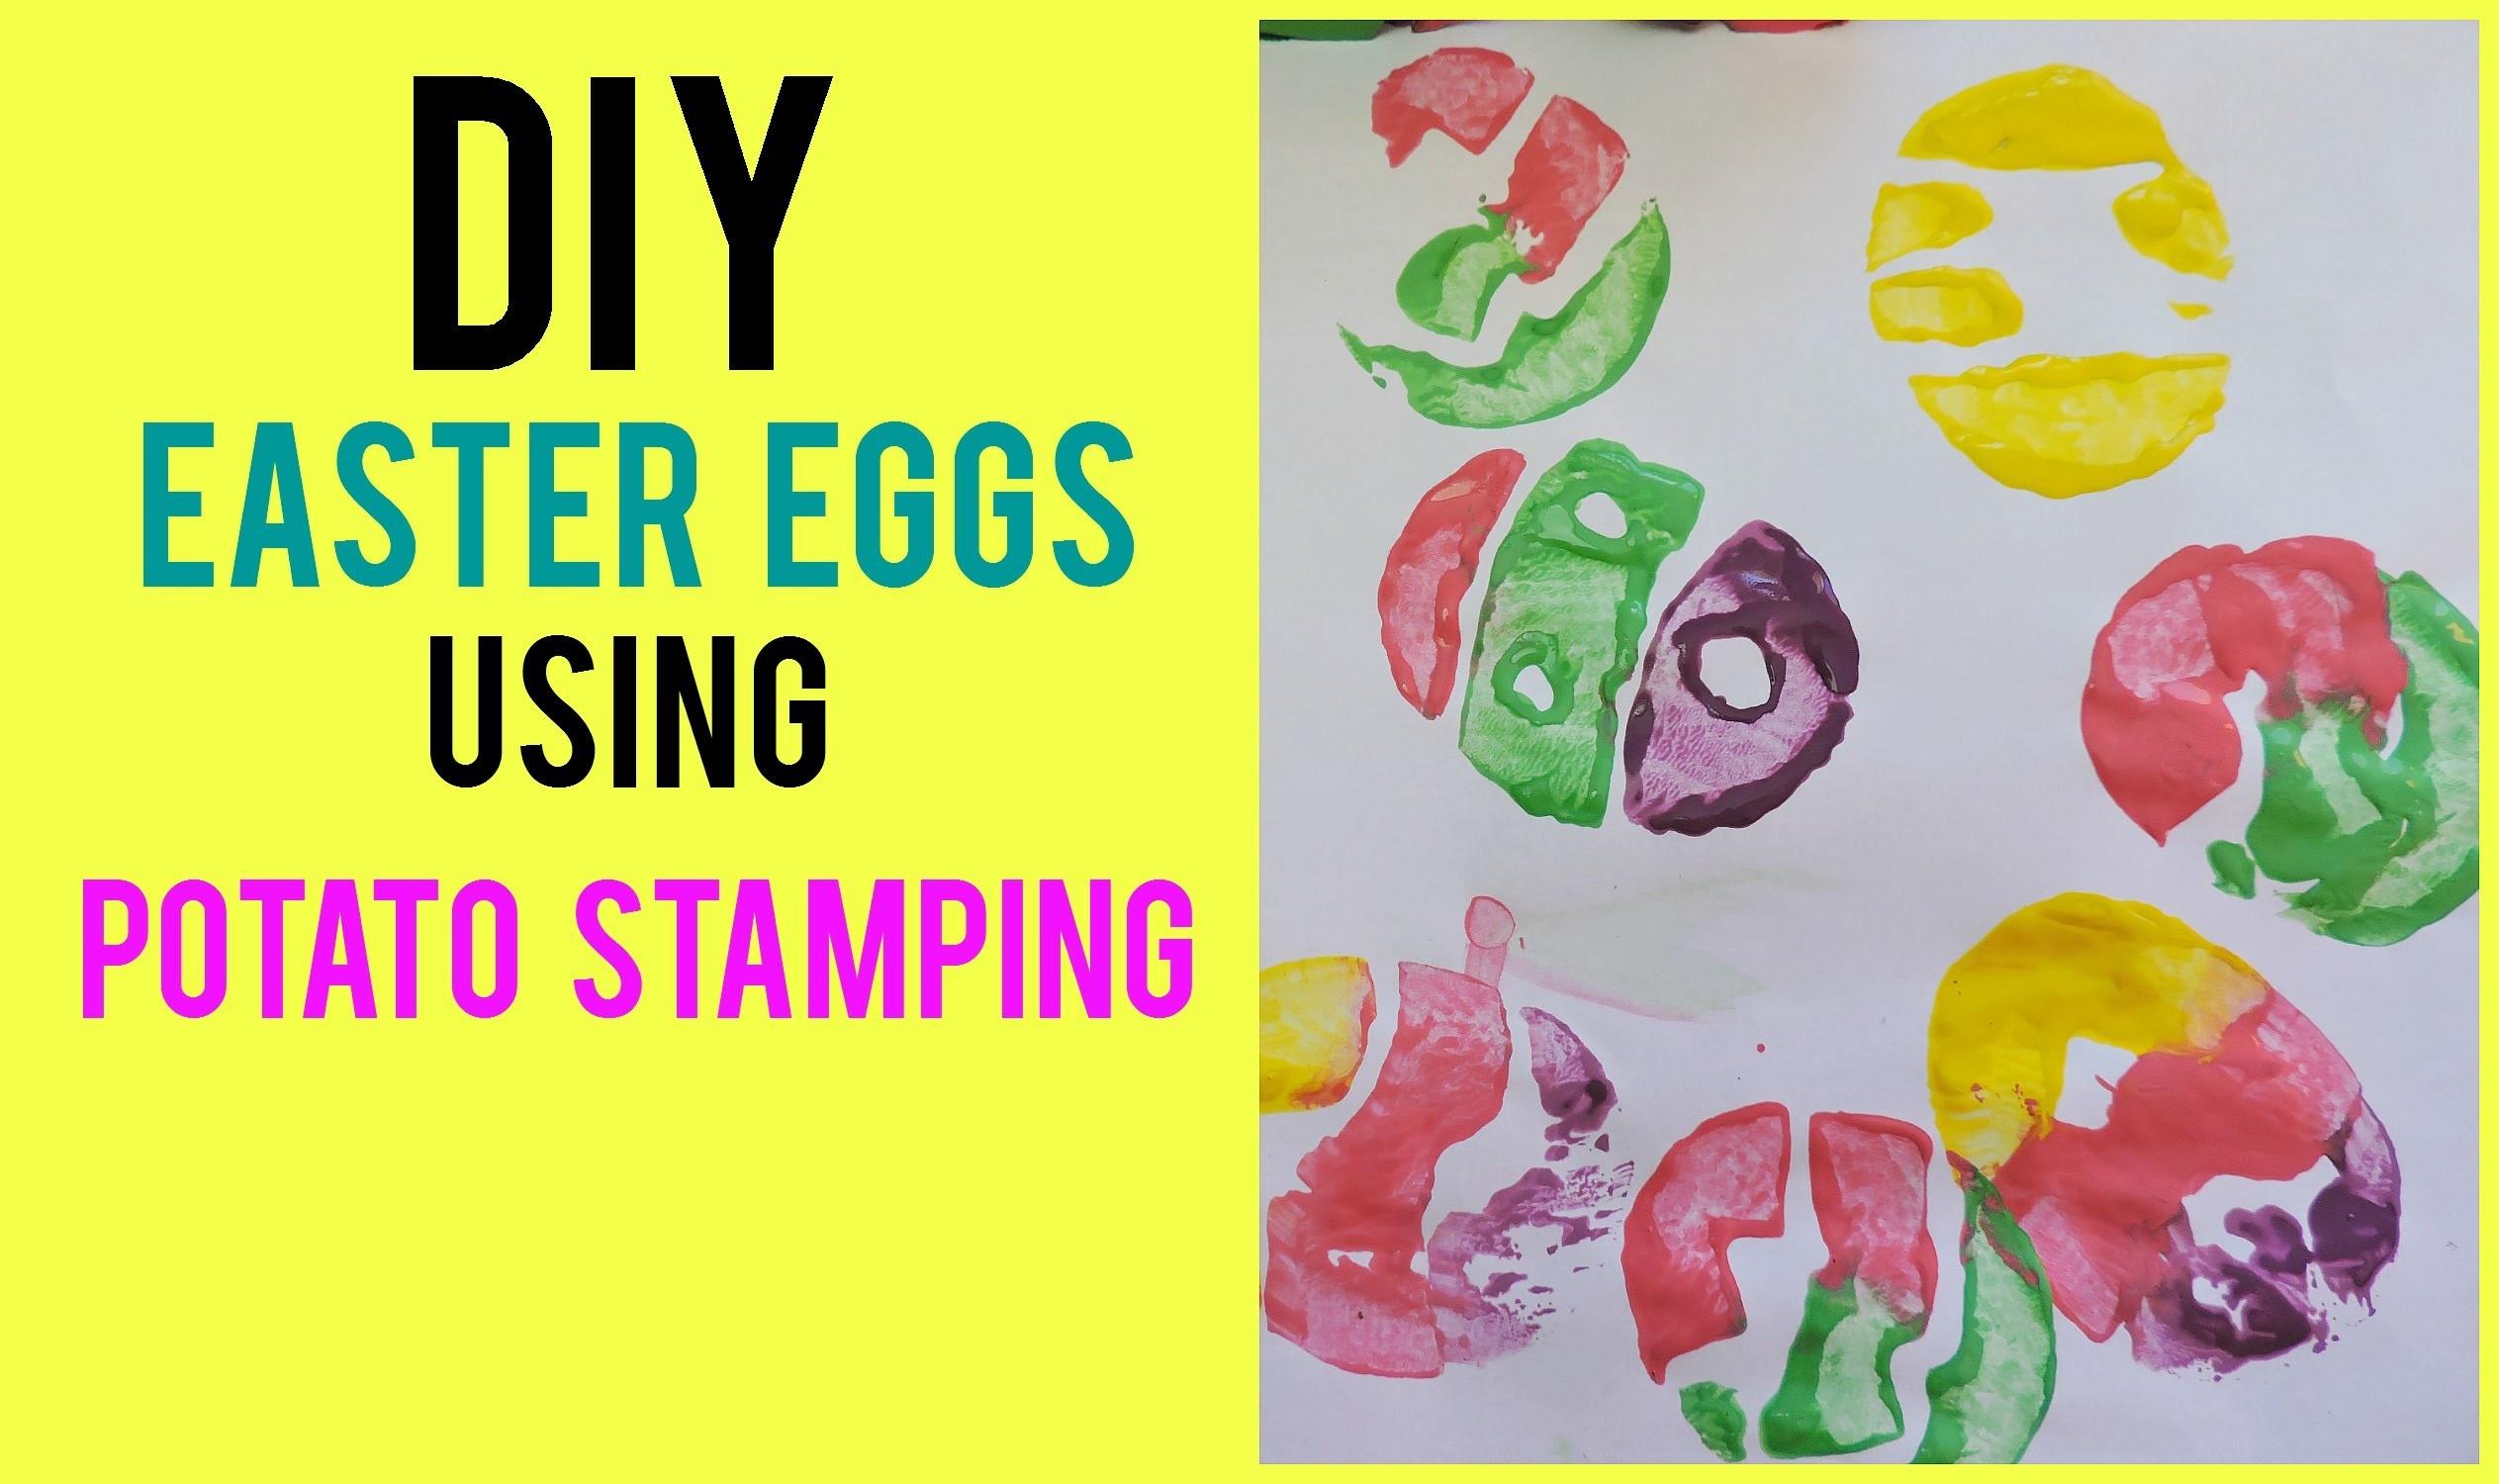 DIY: EASTER EGG POTATO STAMPING